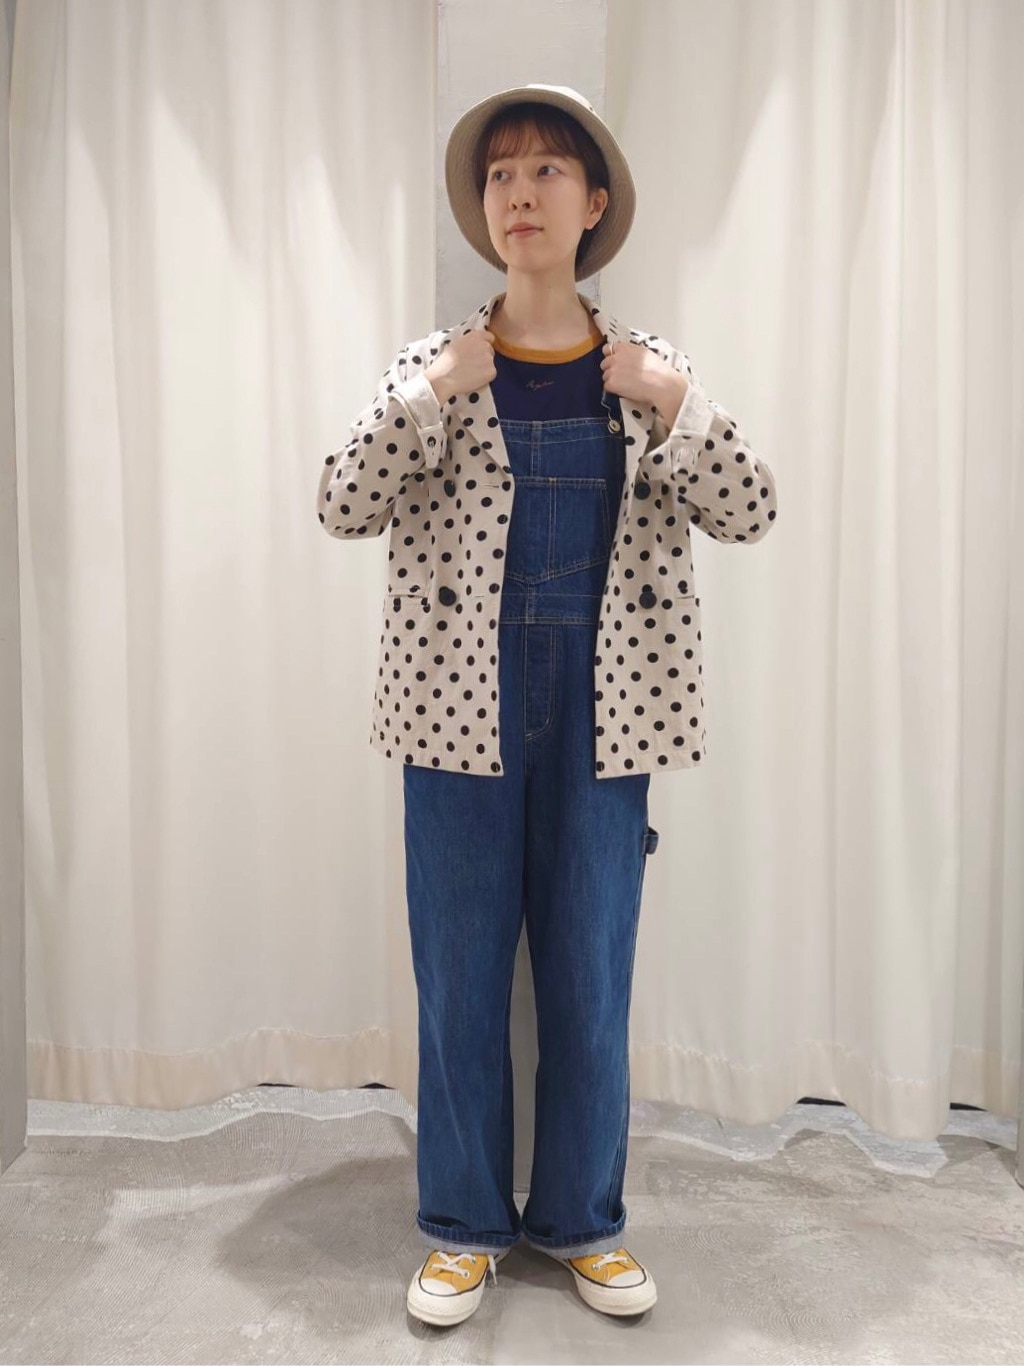 - CHILD WOMAN CHILD WOMAN , PAR ICI ルミネ横浜 身長:158cm 2021.05.22